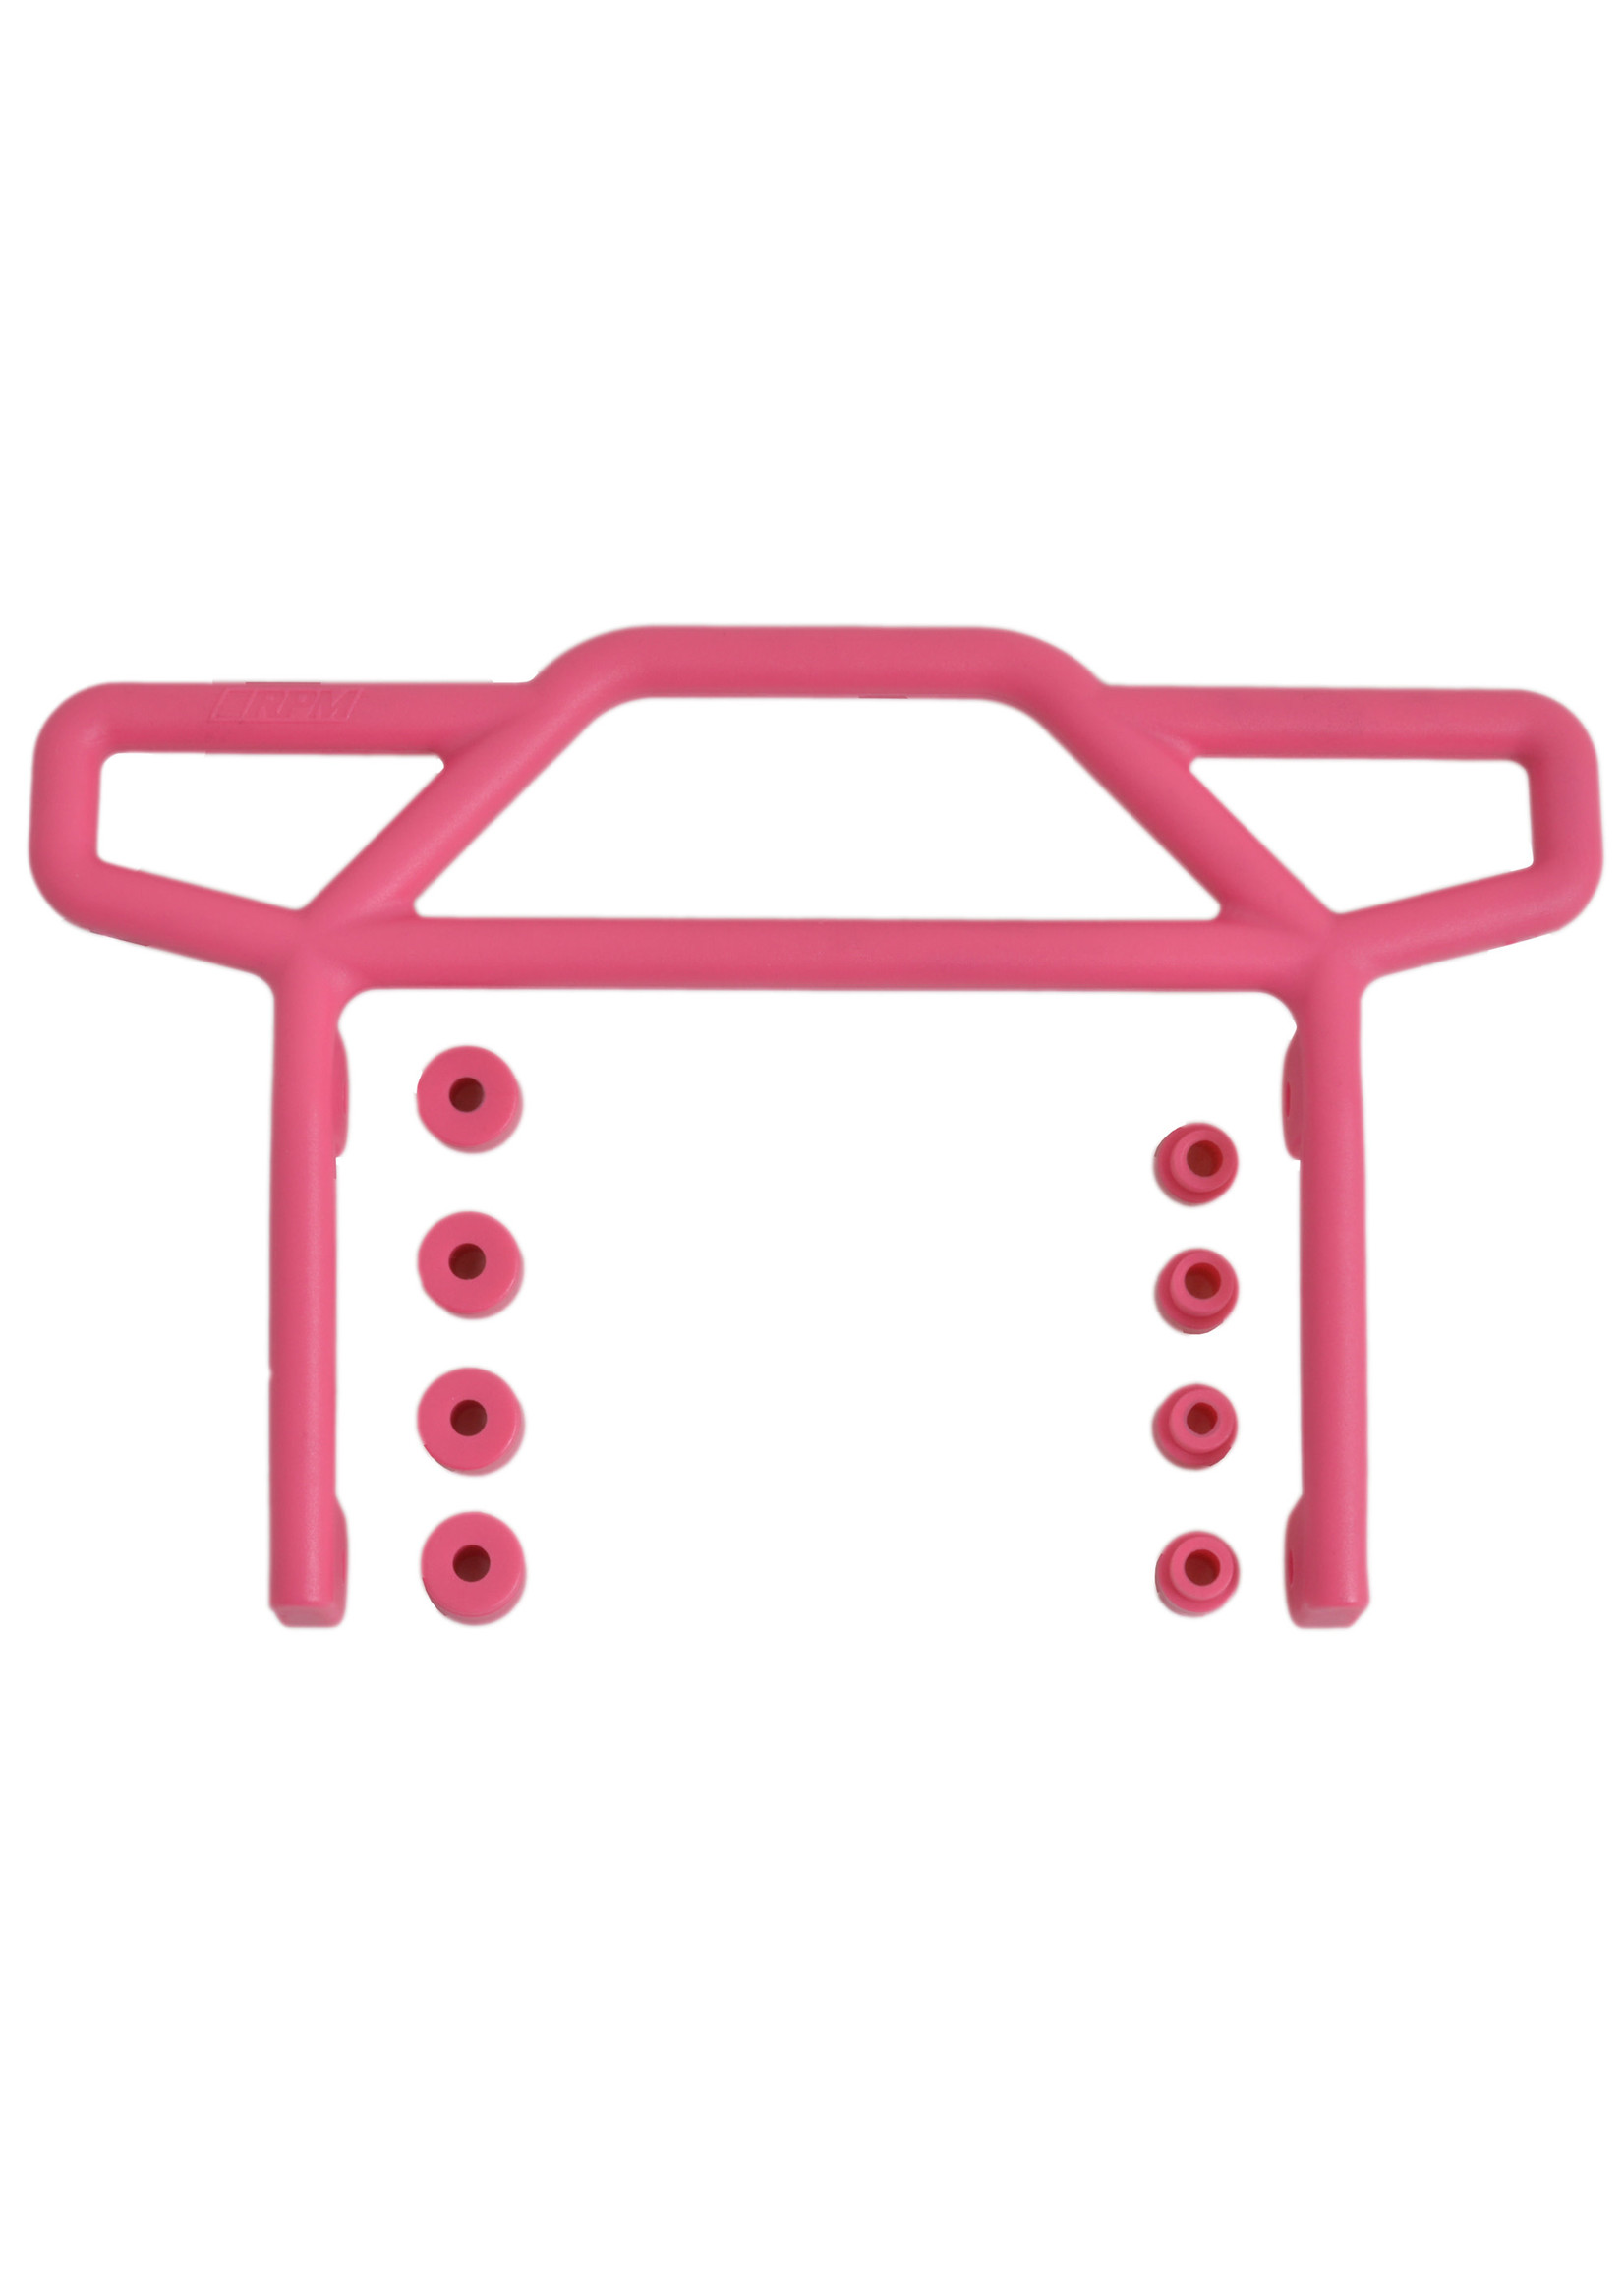 RPM RPM70817 RPM Rear Bumper, Pink, for Traxxas Electric Rustler